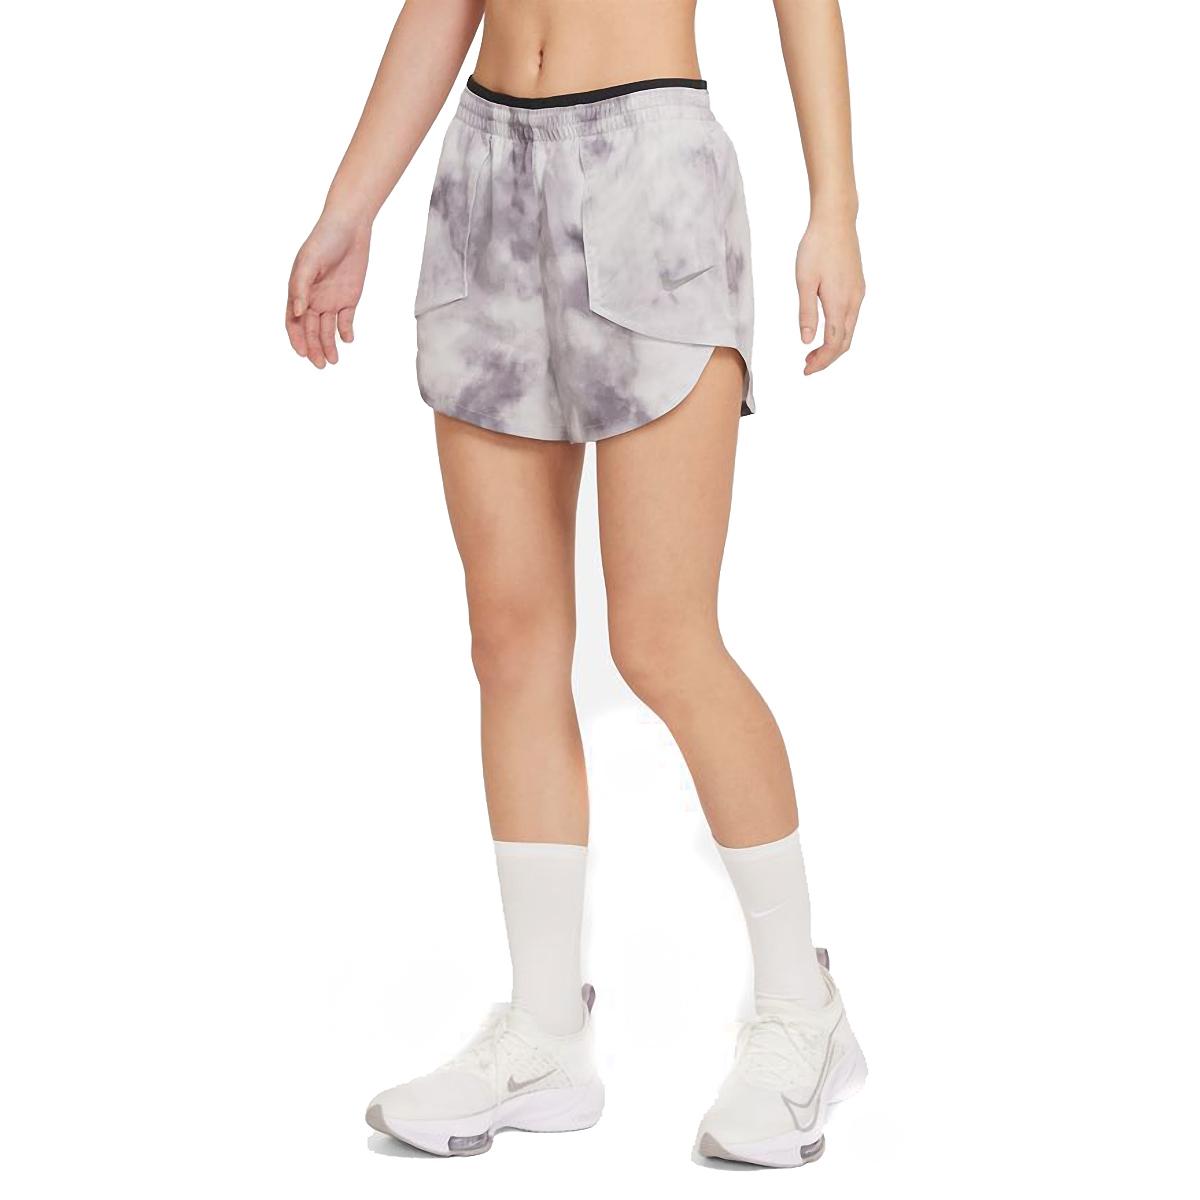 Women's Nike Tempo Luxe Icon Clash Running Shorts - Color: Light Smoke Grey/Dark Smoke Grey/Iron Grey - Size: XS, Light Smoke Grey/Dark Smoke Grey/Iron Grey, large, image 1